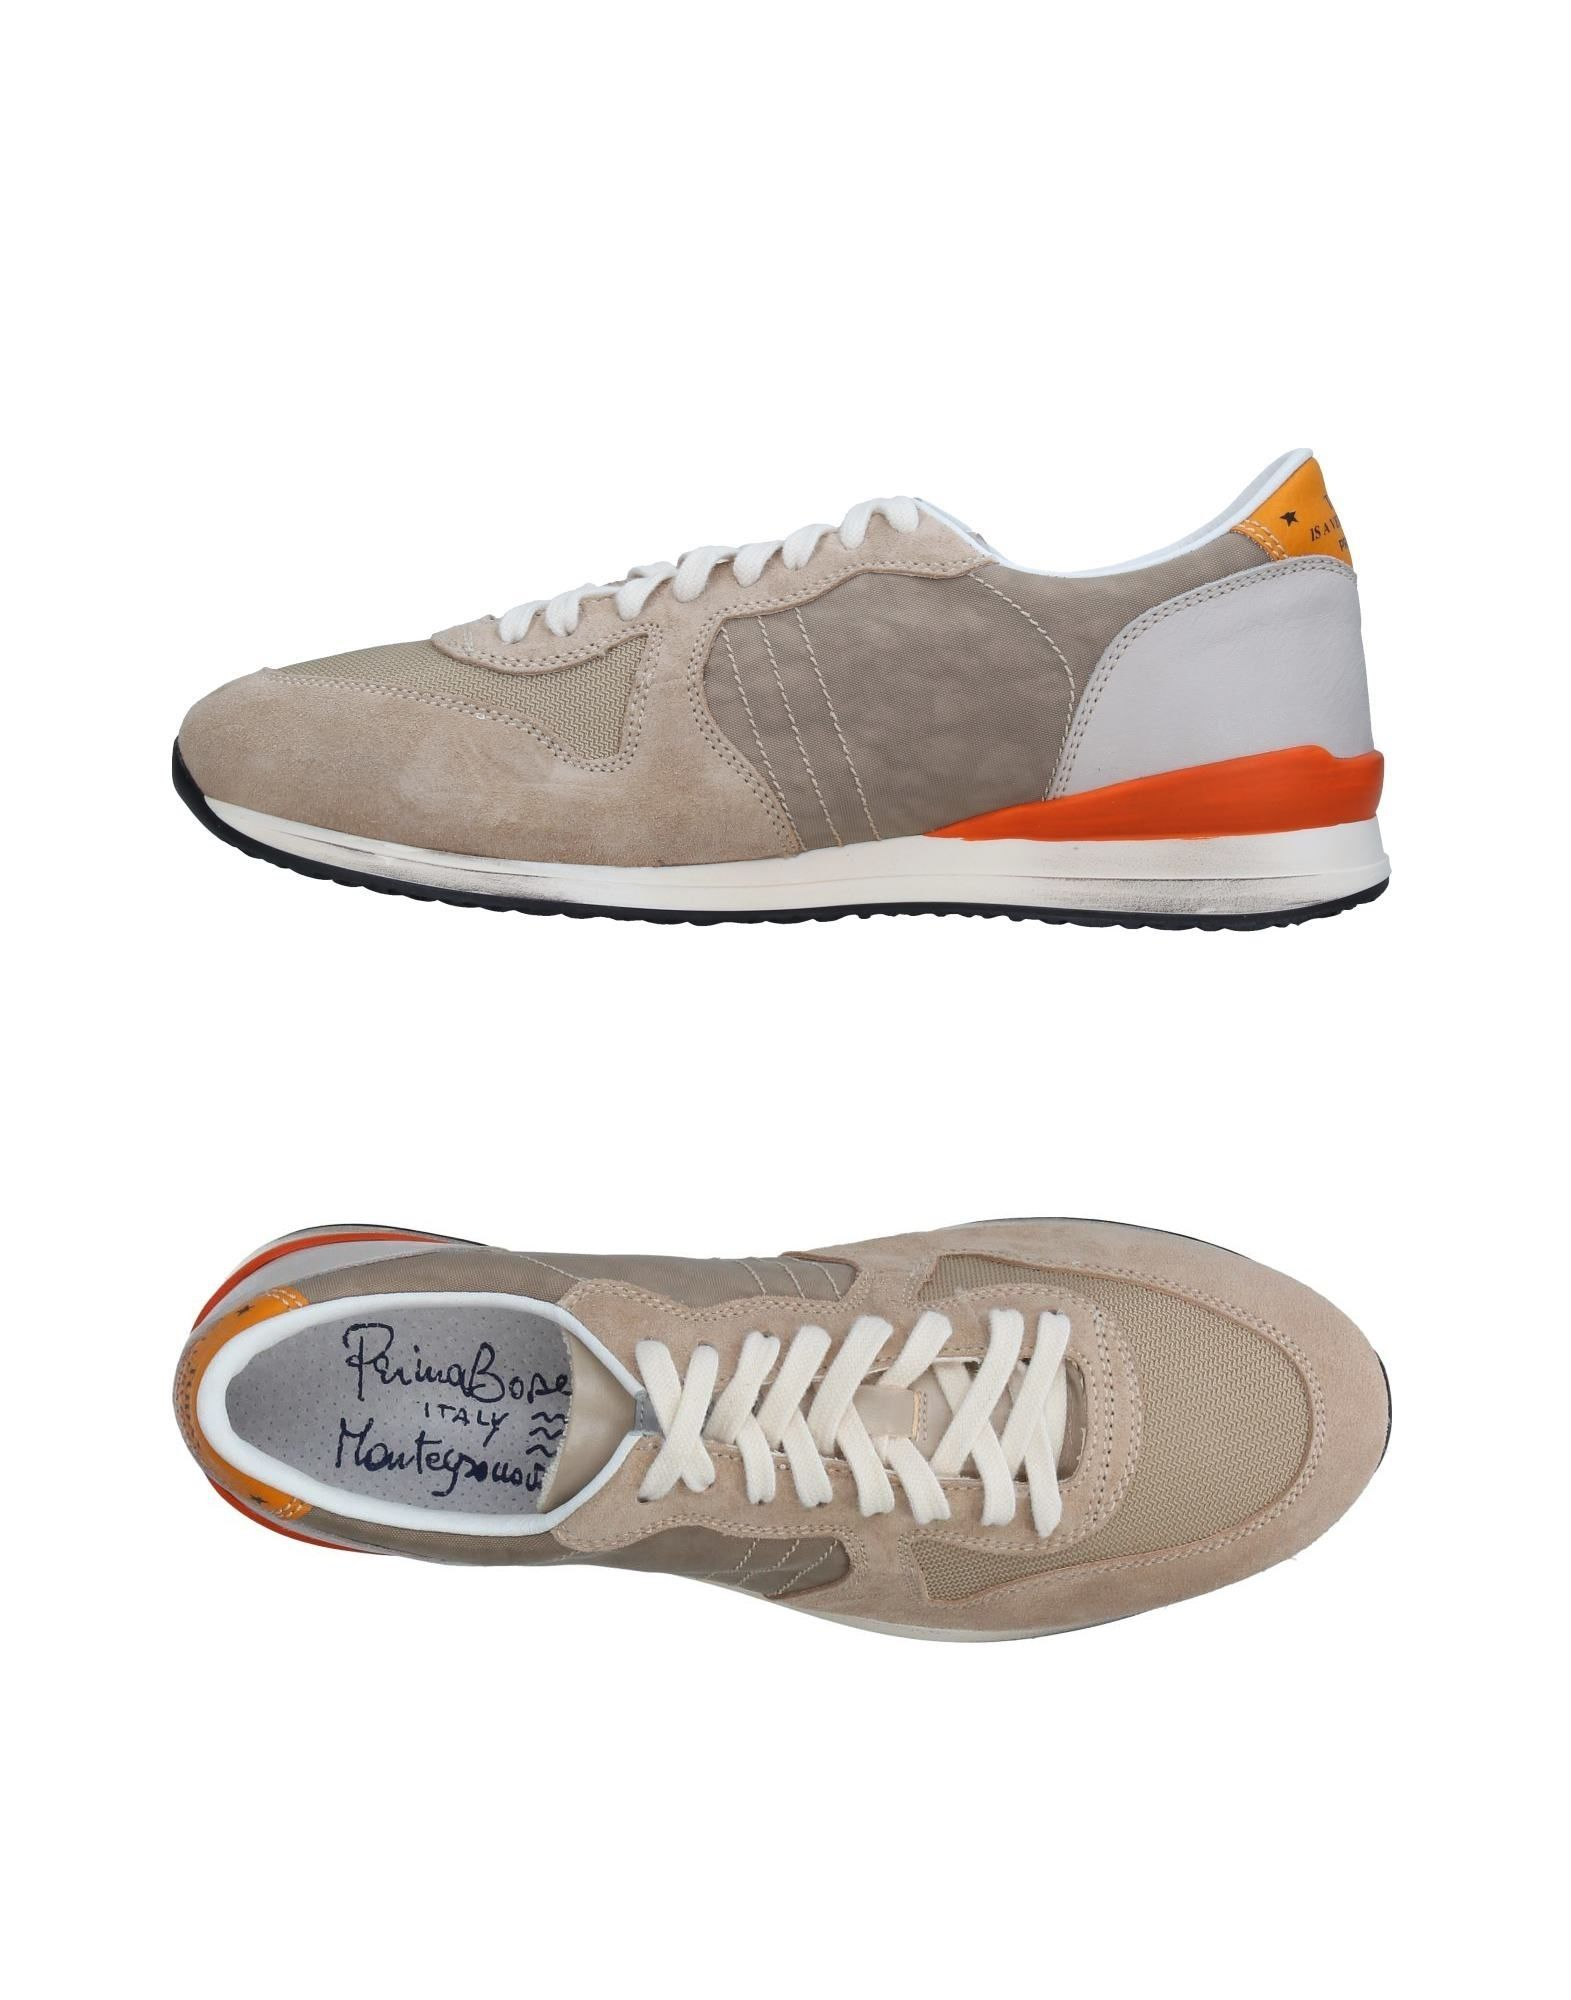 PRIMABASE Herren Low Sneakers & Tennisschuhe Farbe Beige Größe 9 jetztbilligerkaufen